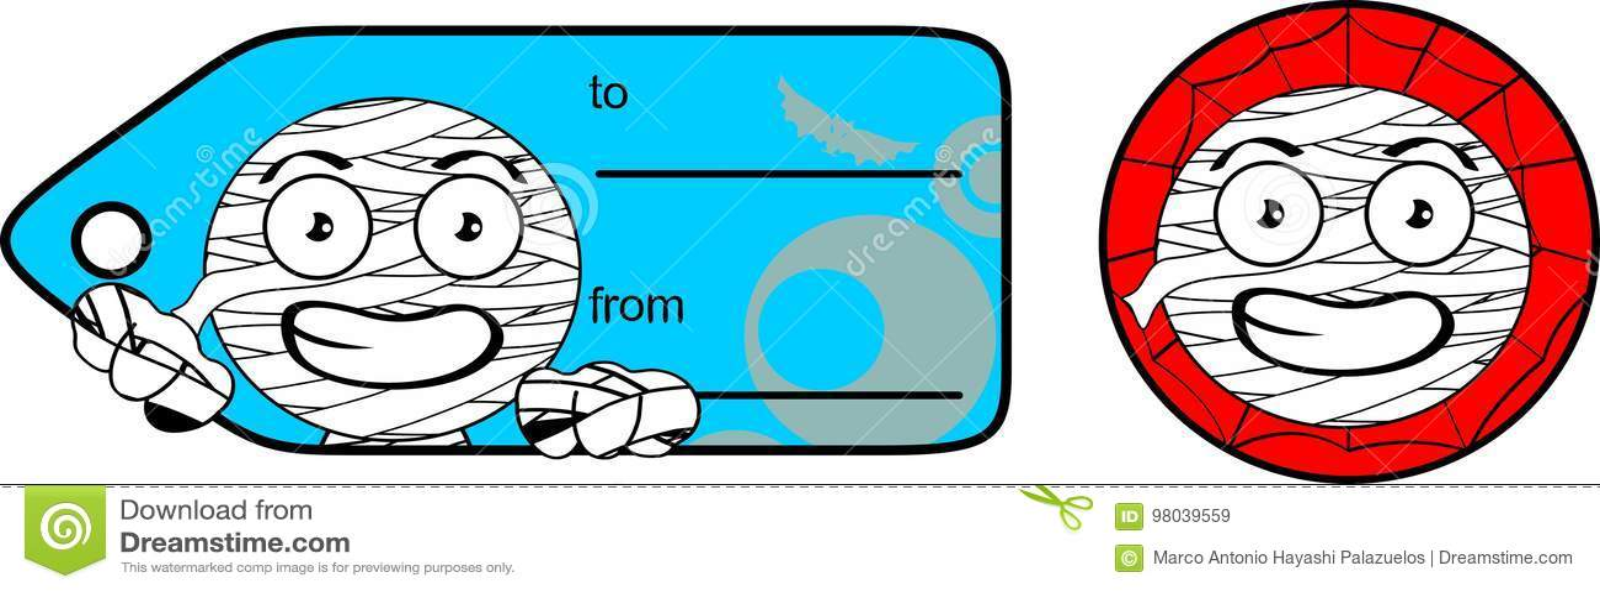 Chubby Little Mummy Cartoon Giftcard Sticker Expression Set Stock